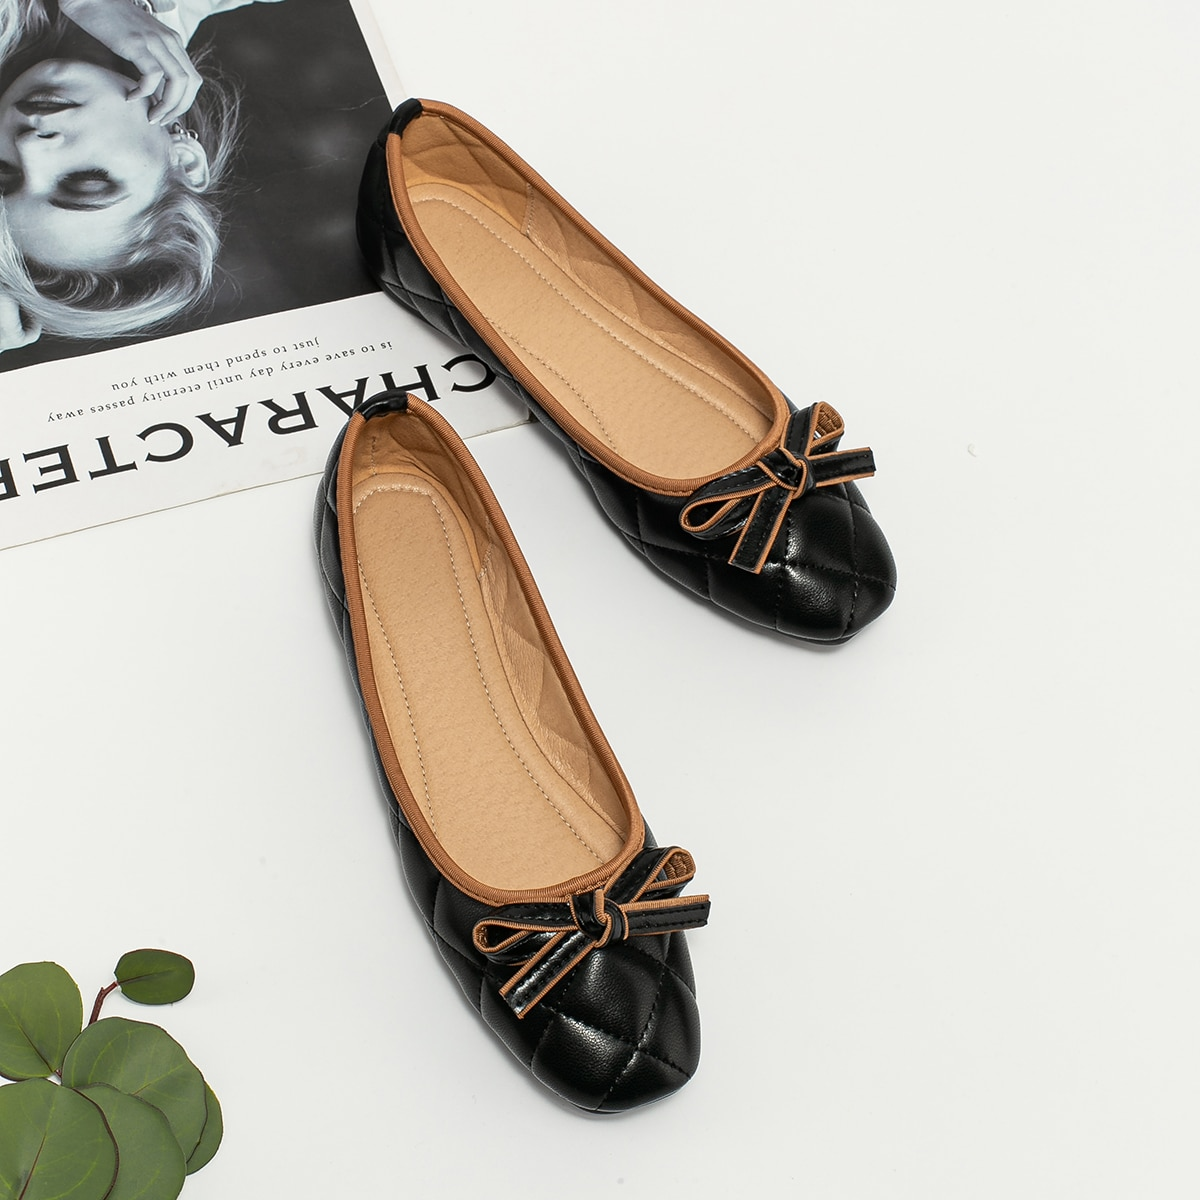 Zapatillas de ballet guateadas con lazo